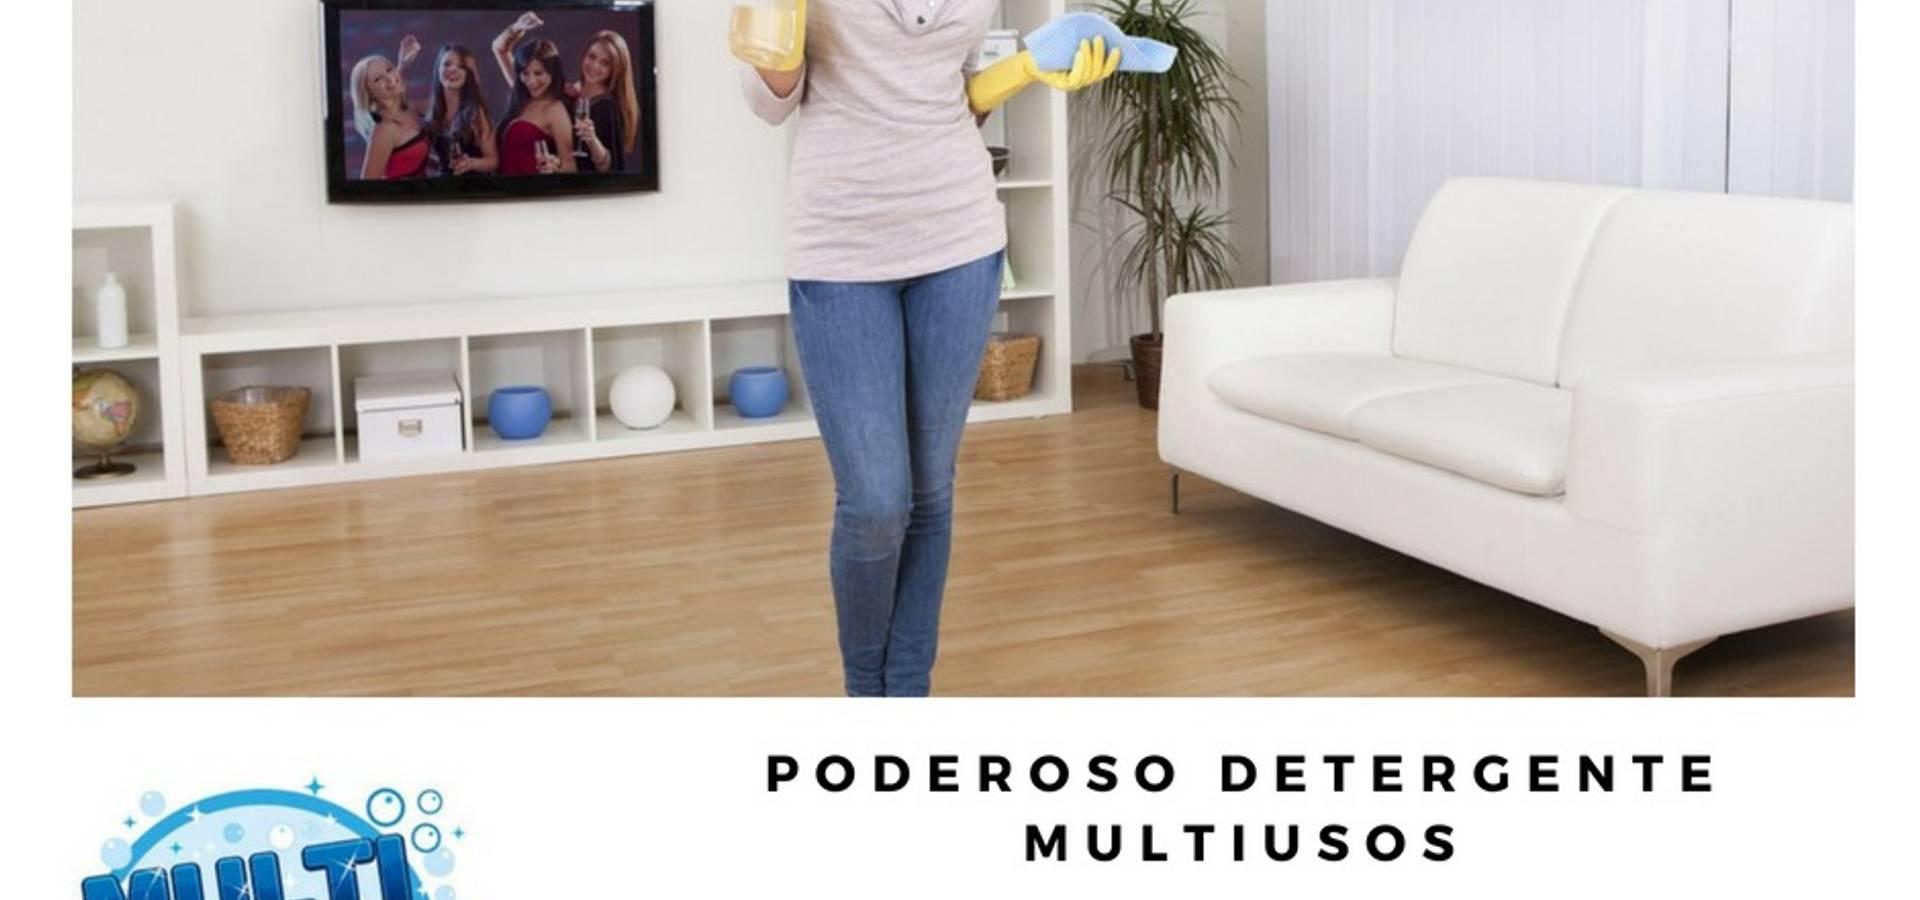 Multipoder